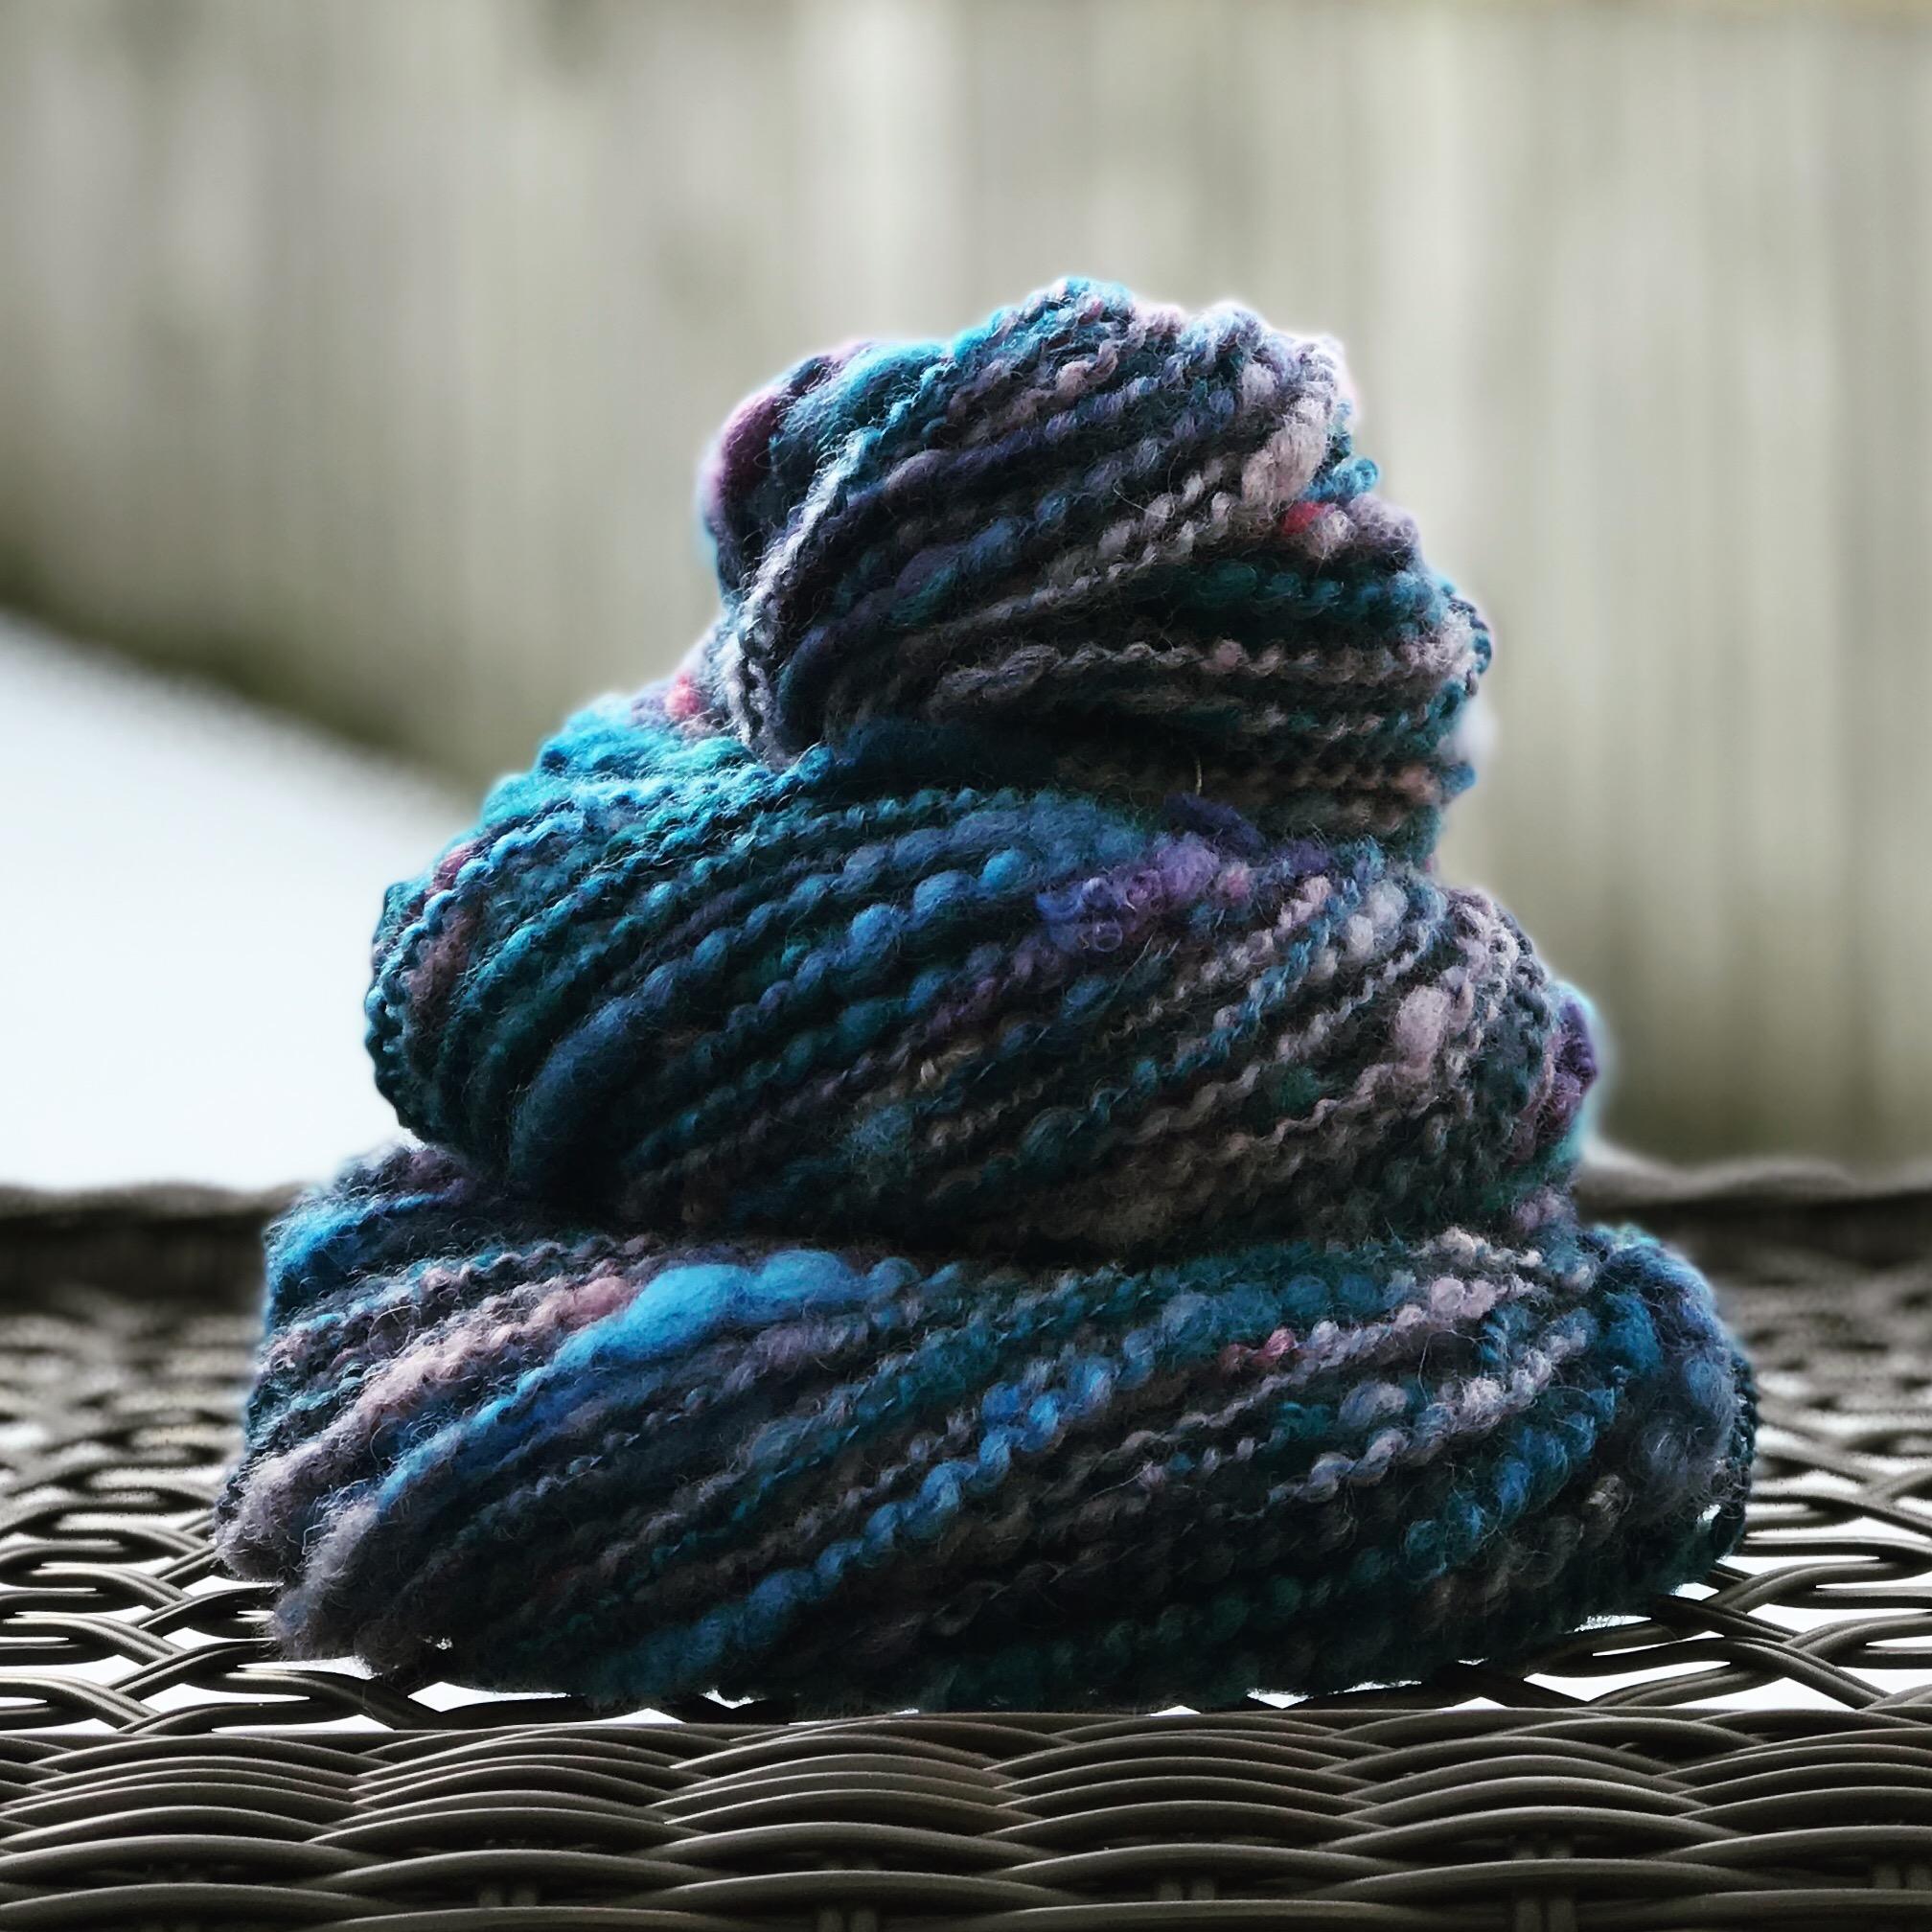 Handspun from Fleece to Yarn